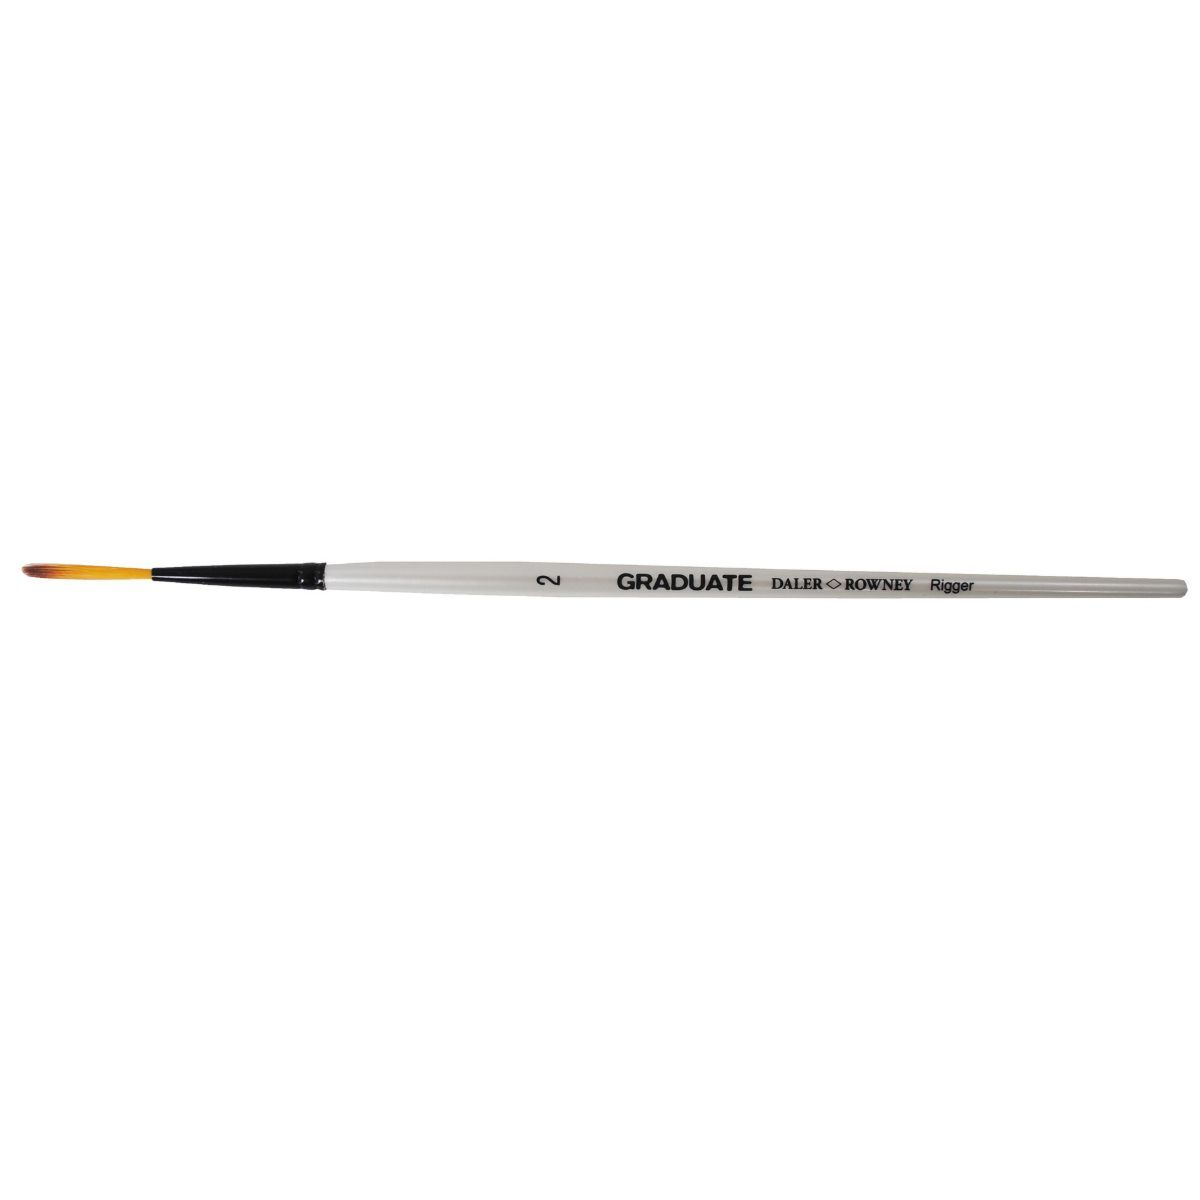 Daler Rowney Graduate Brush Dark Tip Synthetic Rigger 2